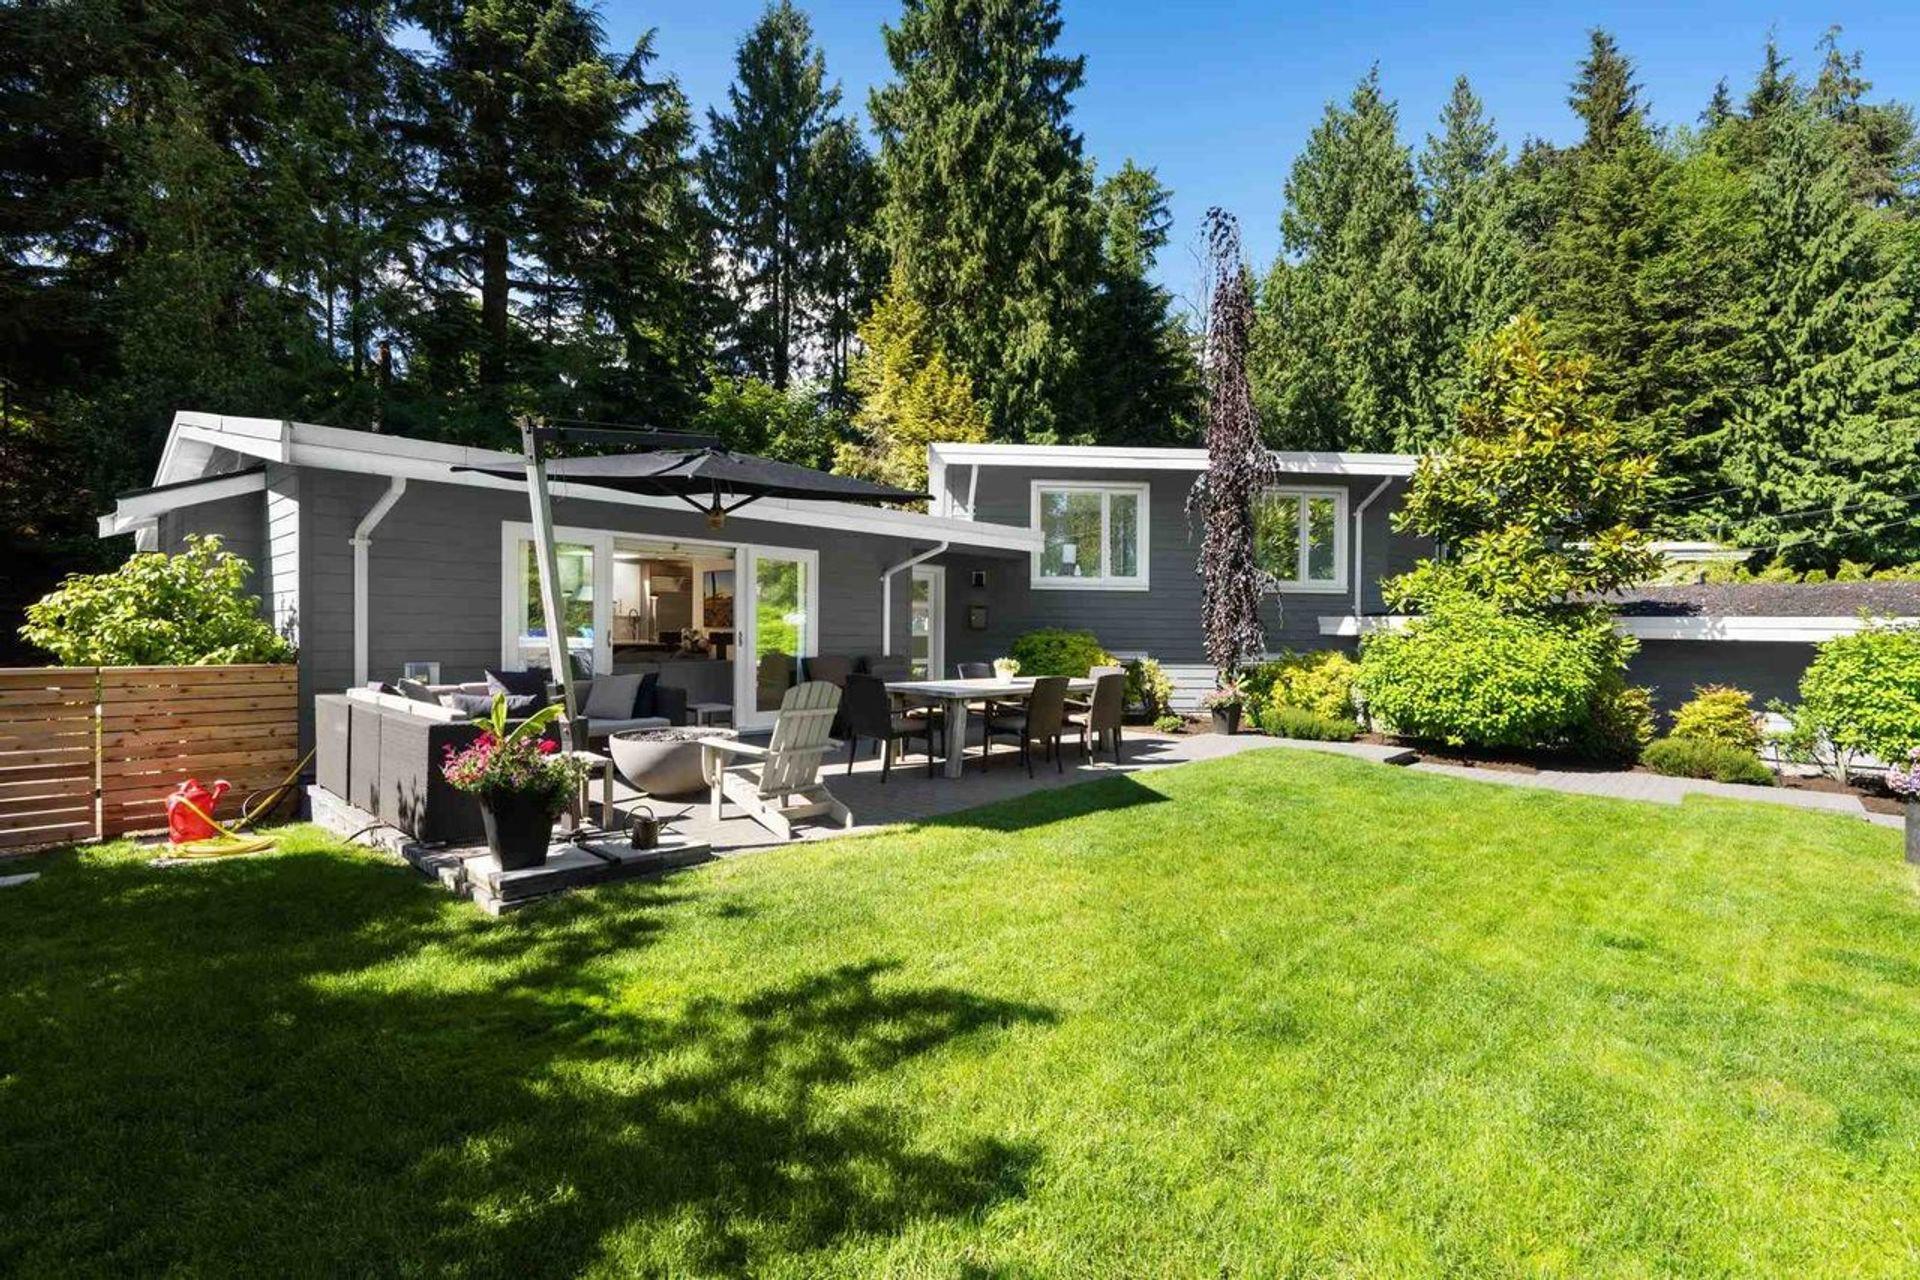 3589 Fairmont Road, Edgemont, North Vancouver